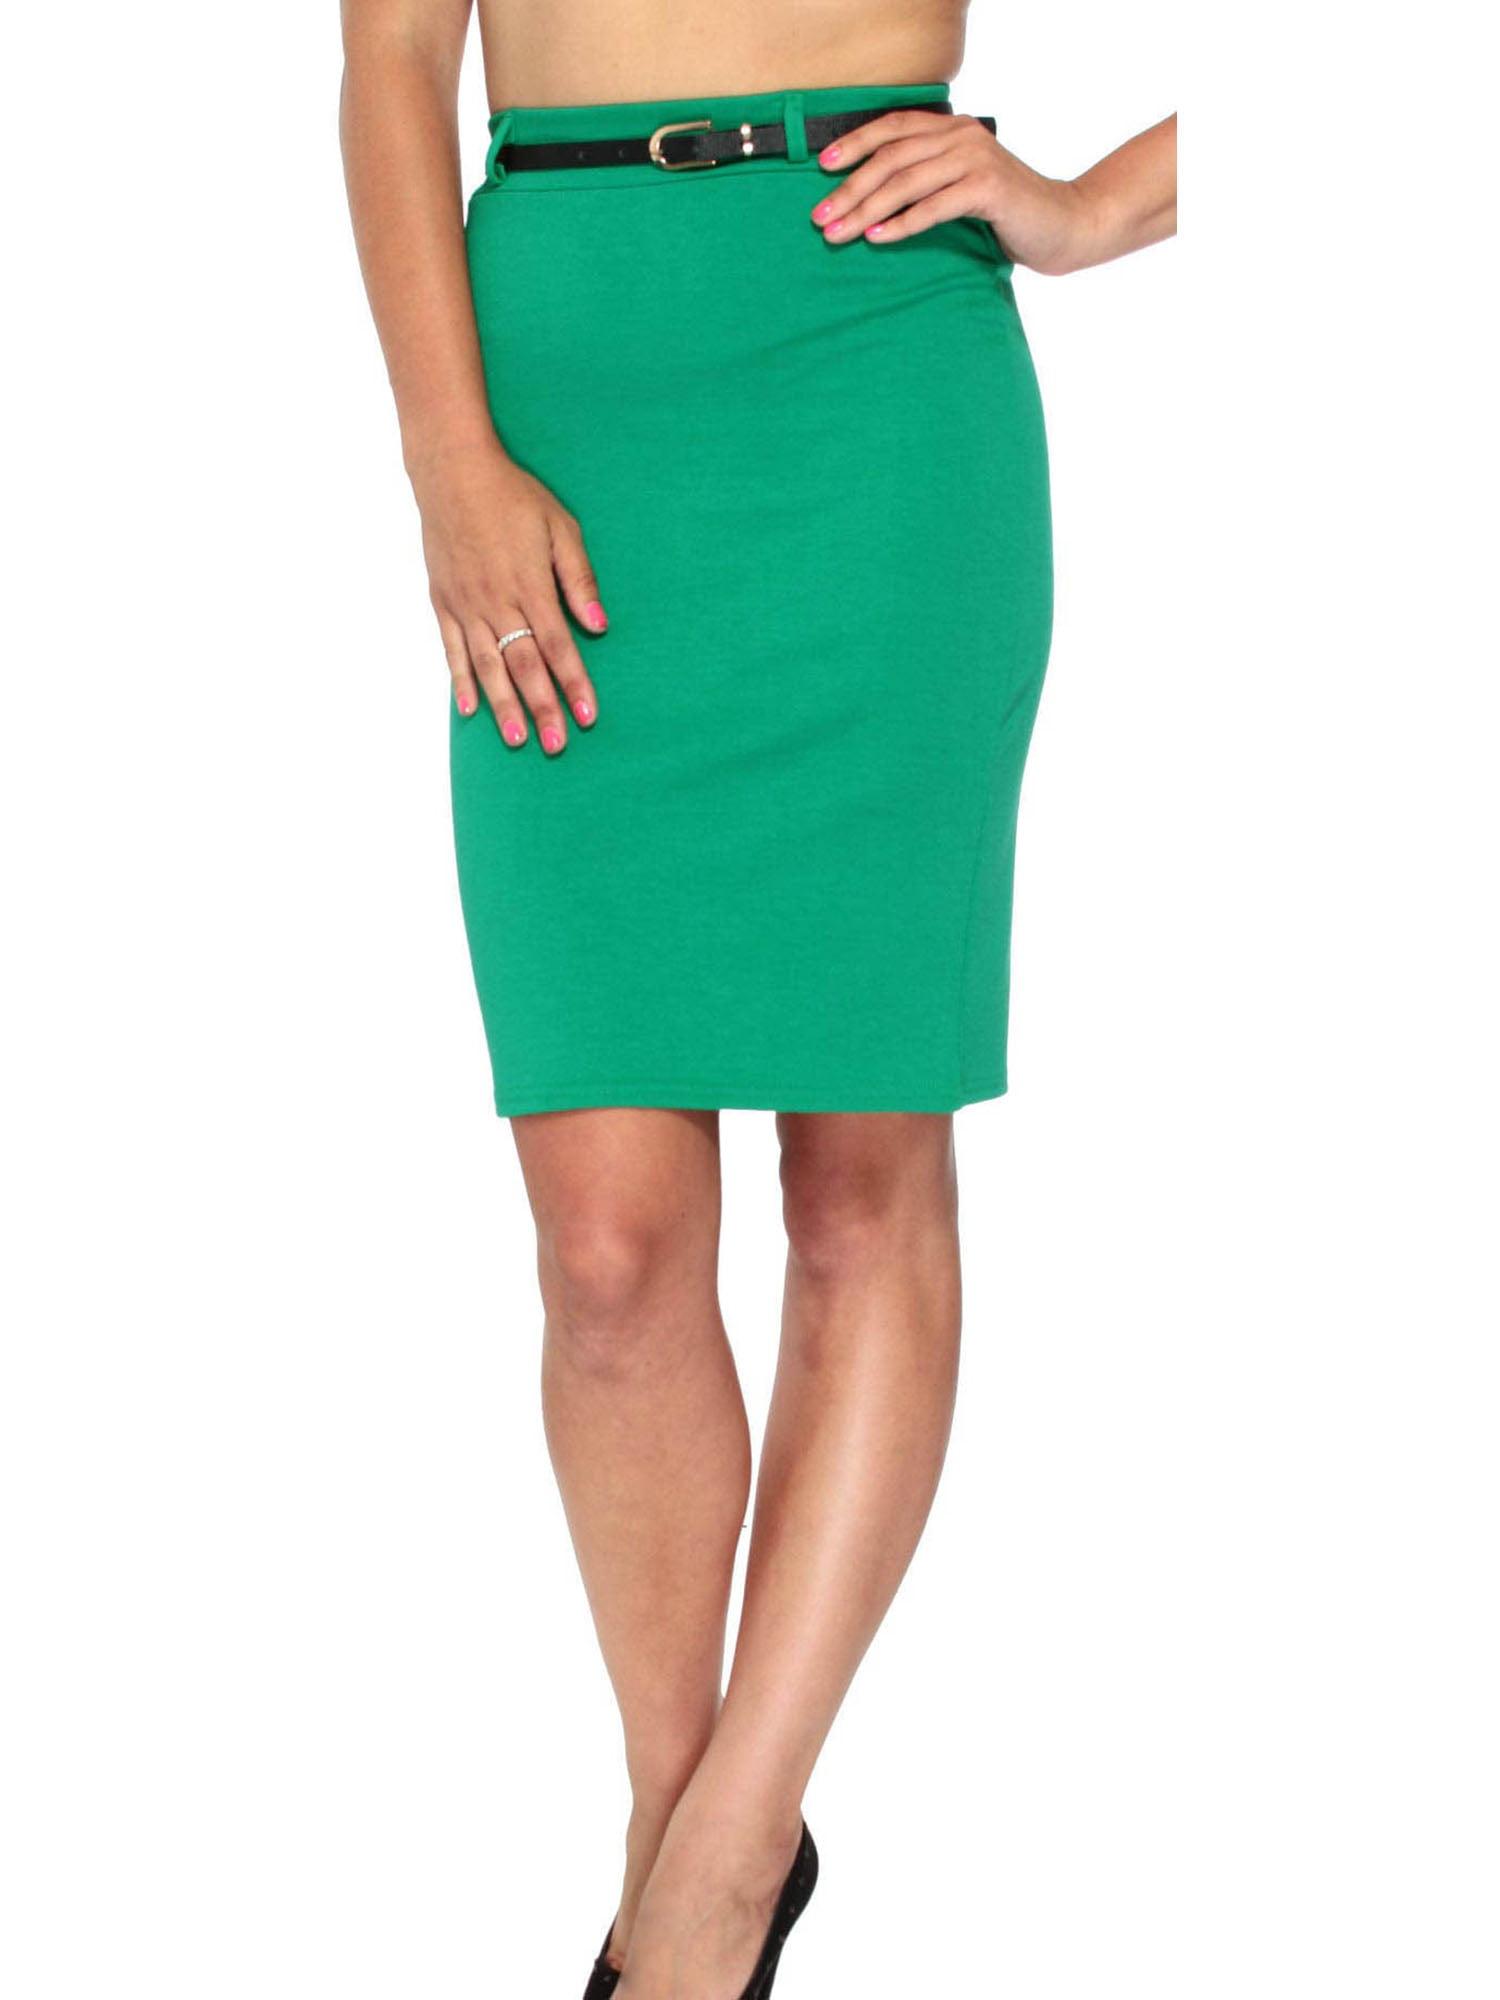 Hot Womens Fitted Business Knee Long Slimming High Waist Office Pencil Skirt